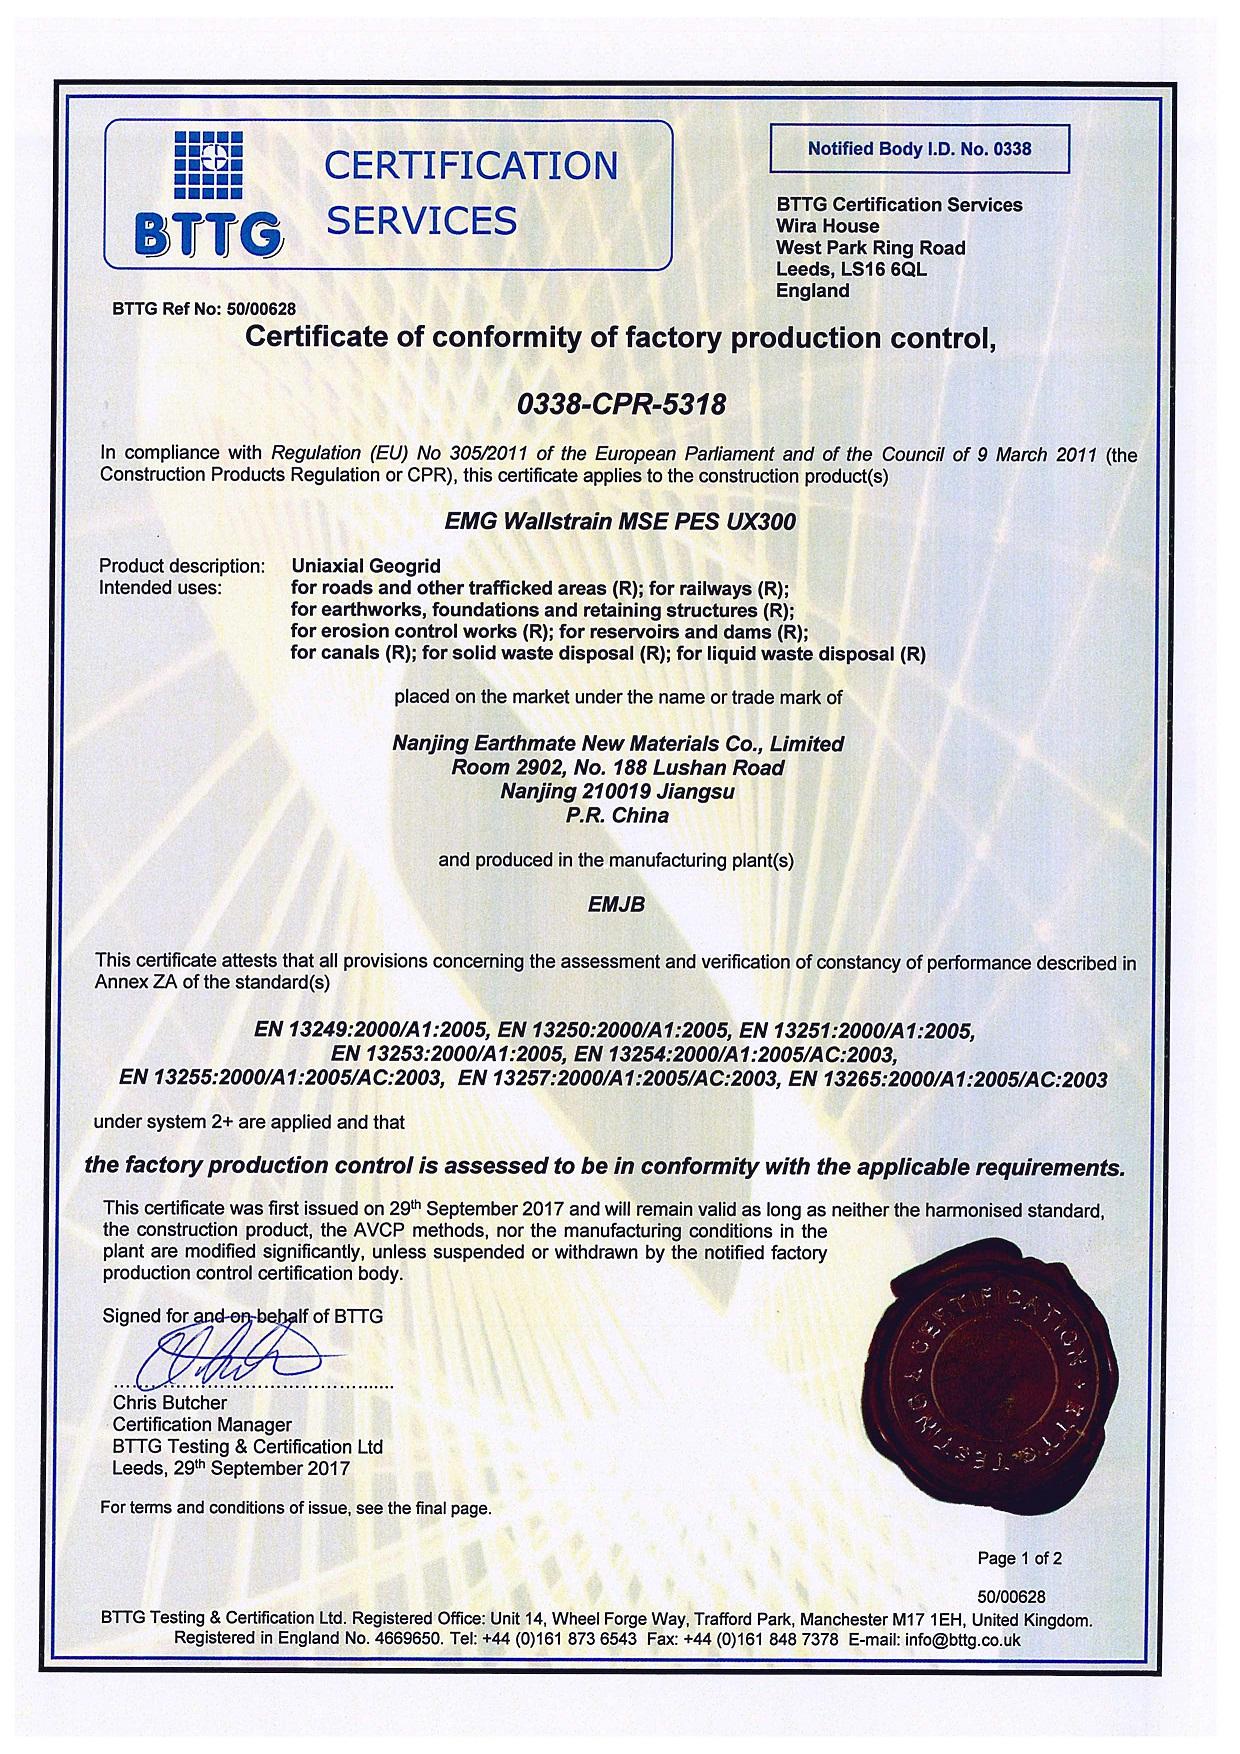 WALLSTRAIN PES Geogrids CE Certificate of Conformity|BTTG, U.K.